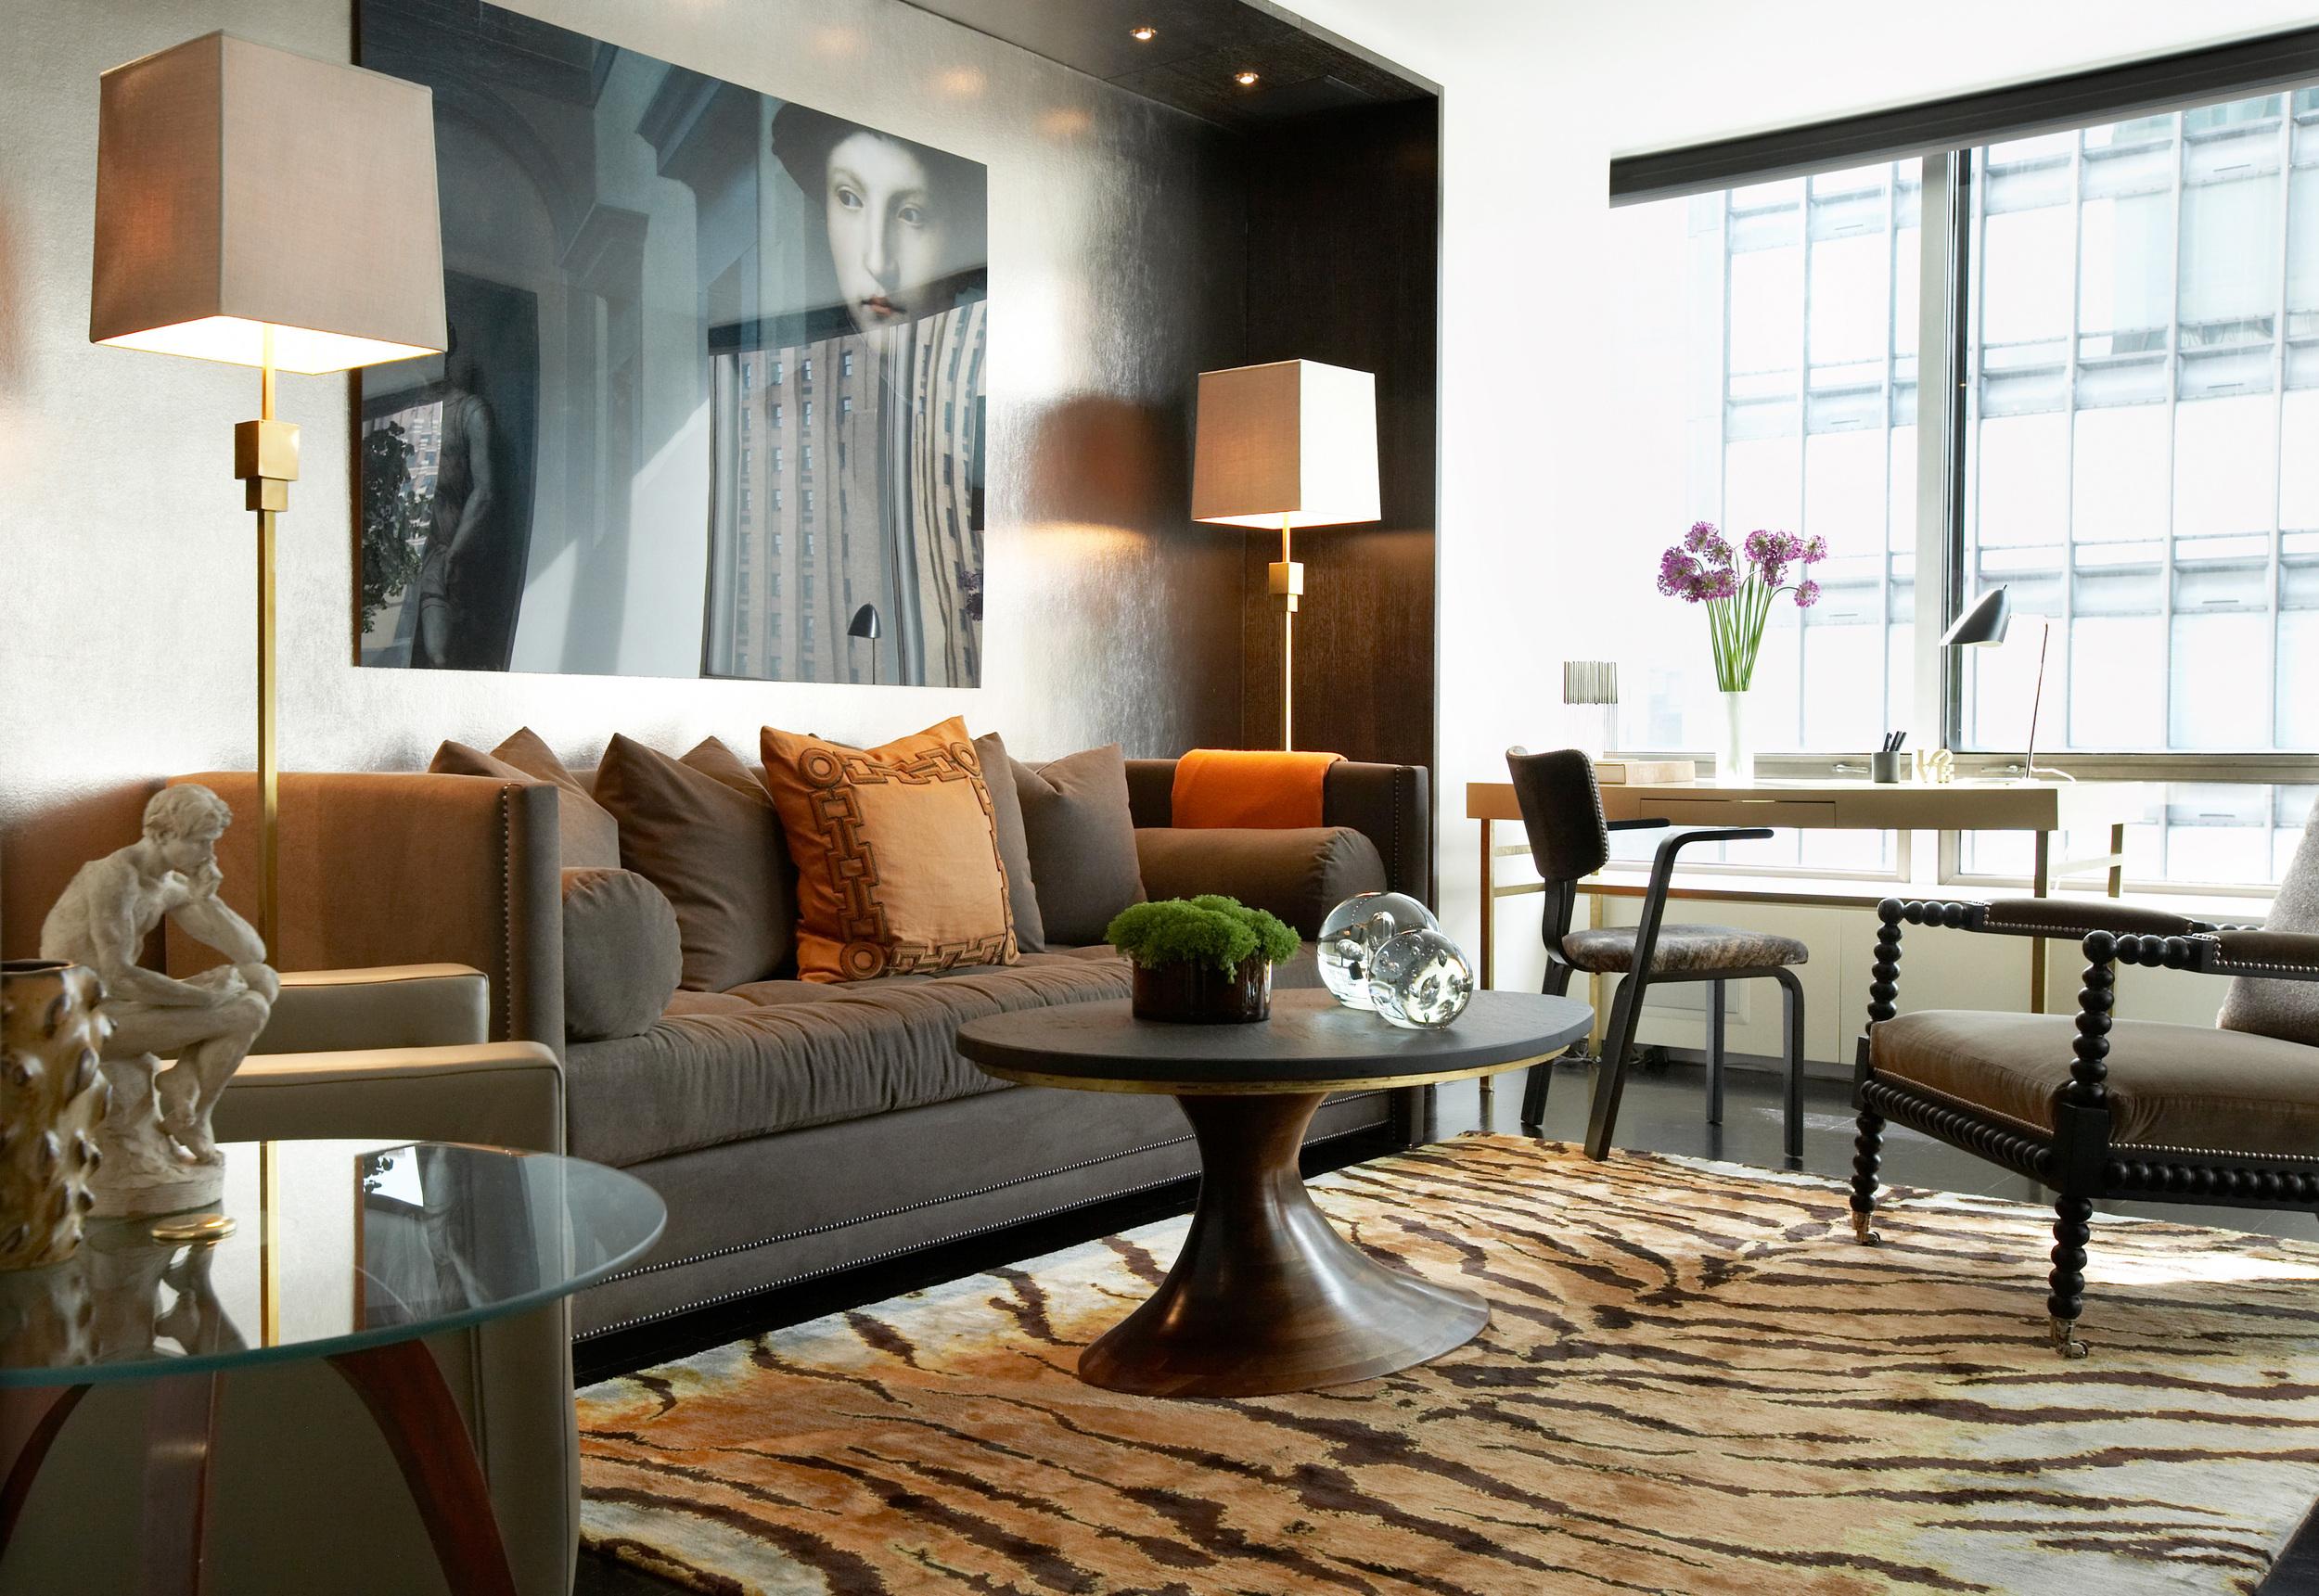 Carini Lang's  Tiger Caramel  carpet shown in an interior designed by David Scott